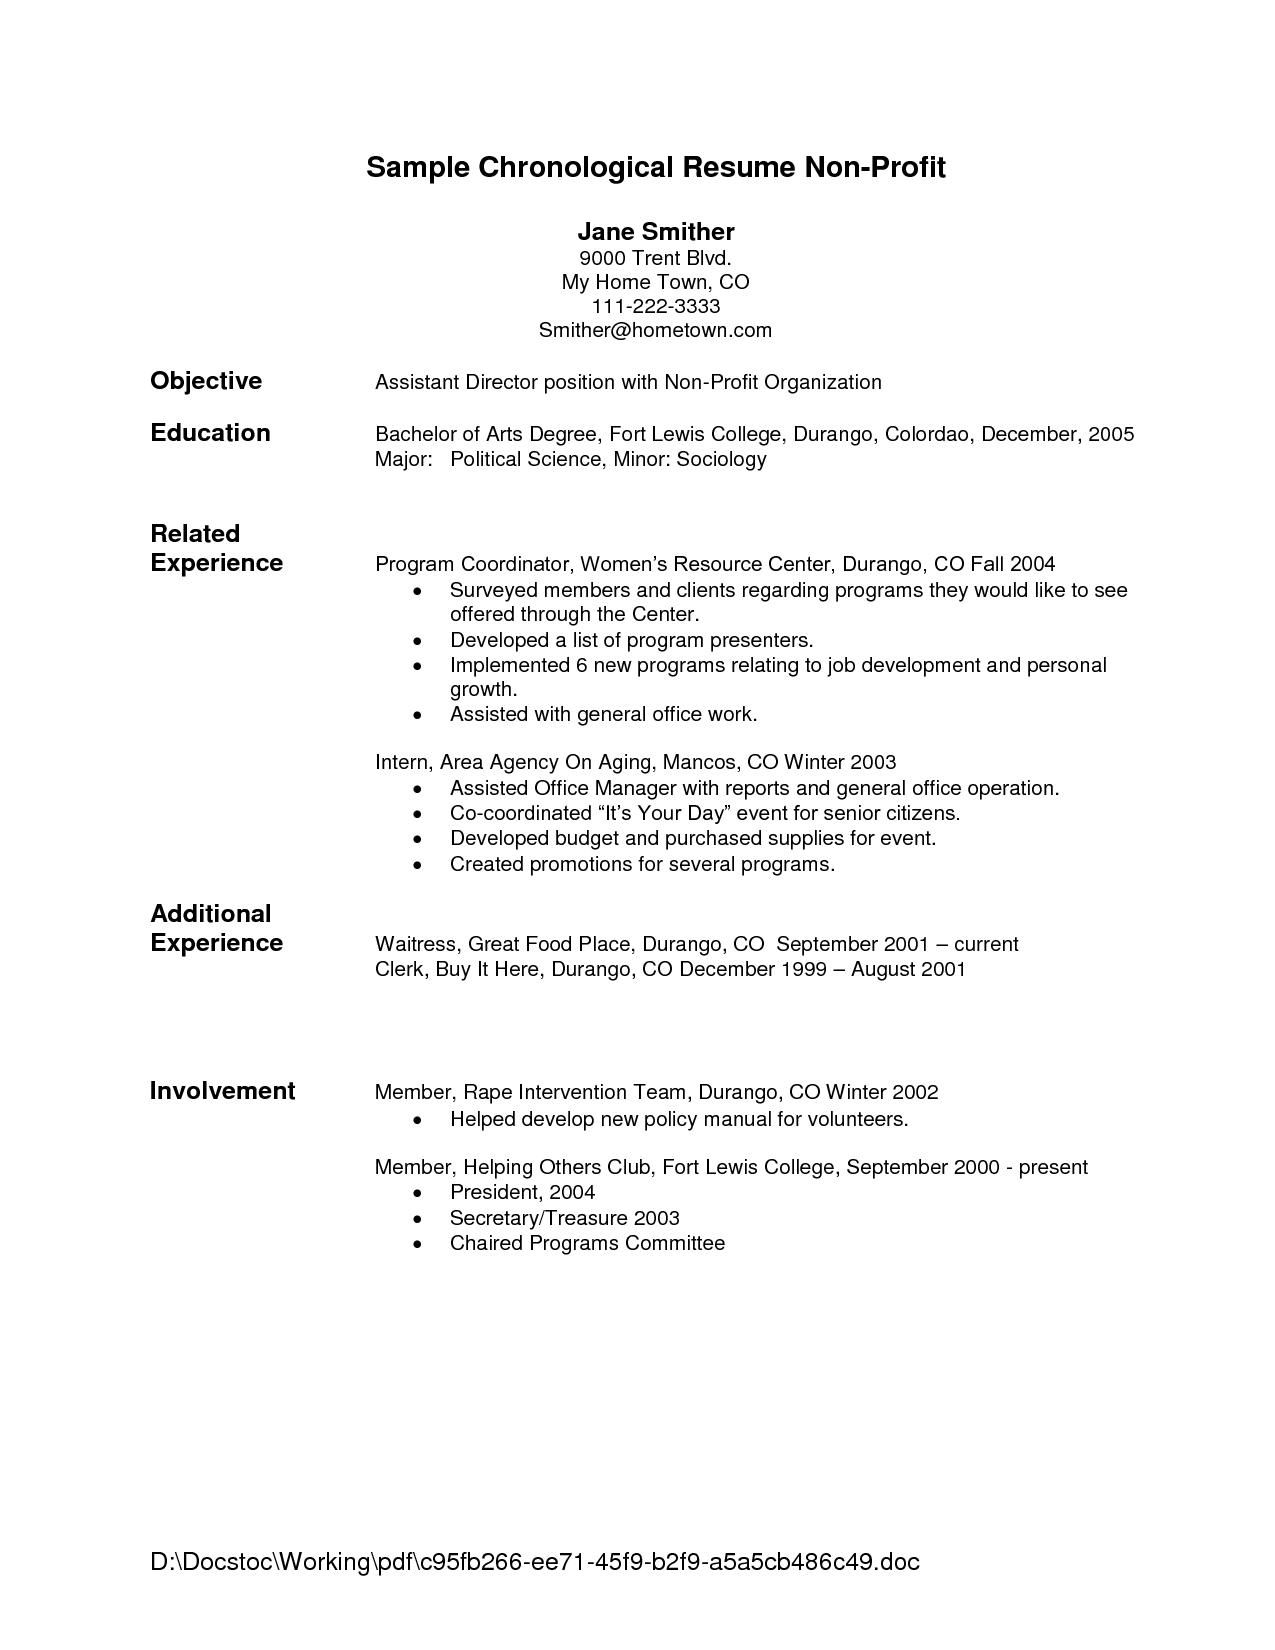 Resume Templates Non Chronological ResumeTemplates